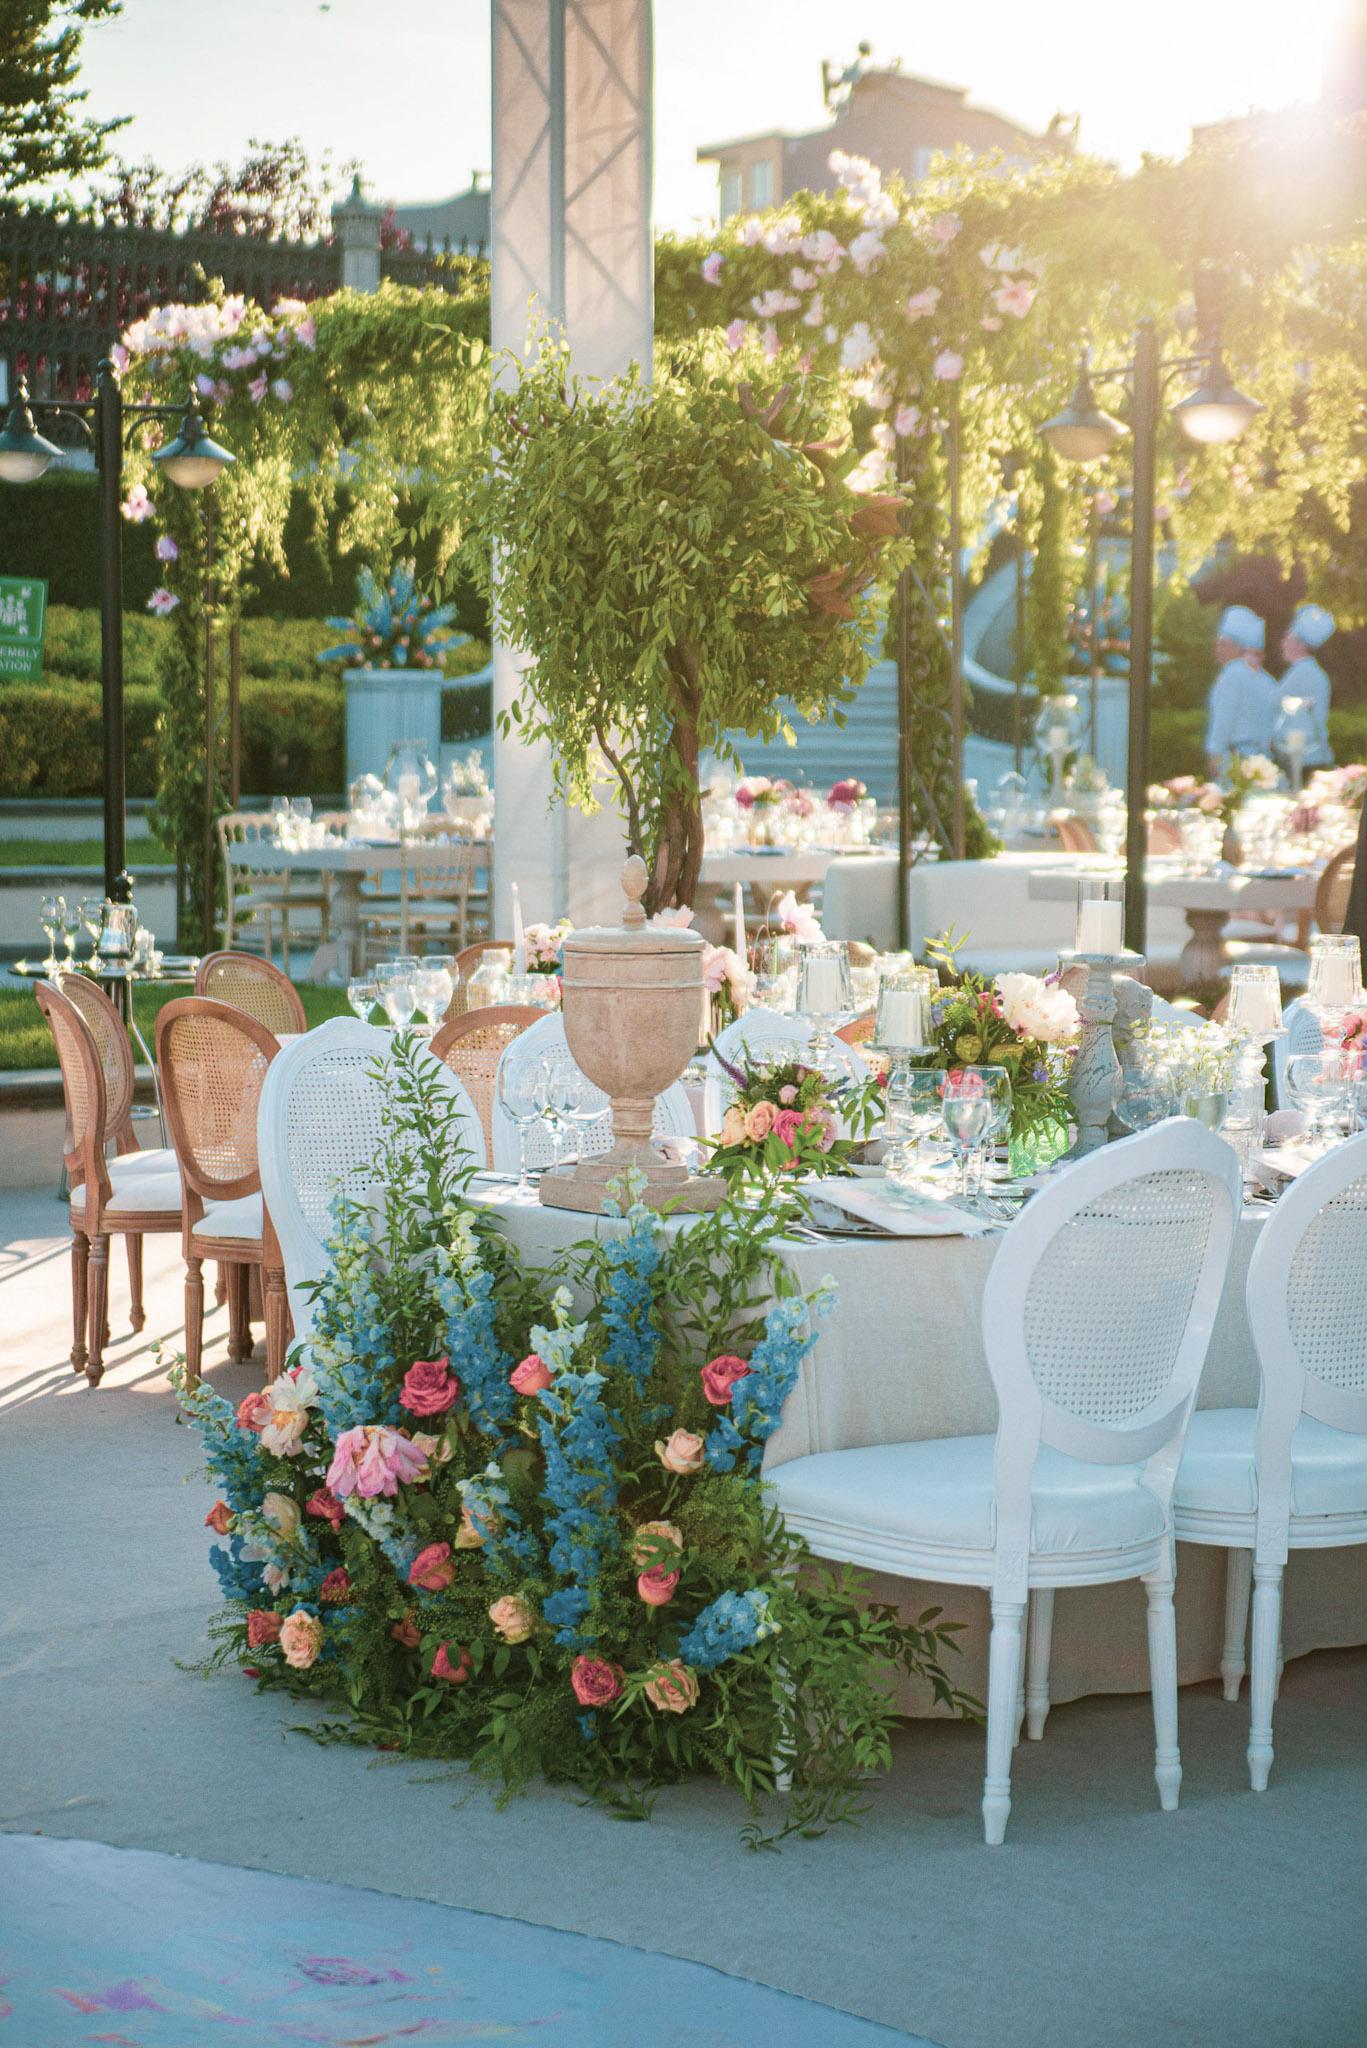 Four Seasons Bosphorus Wedding 22.06.2019